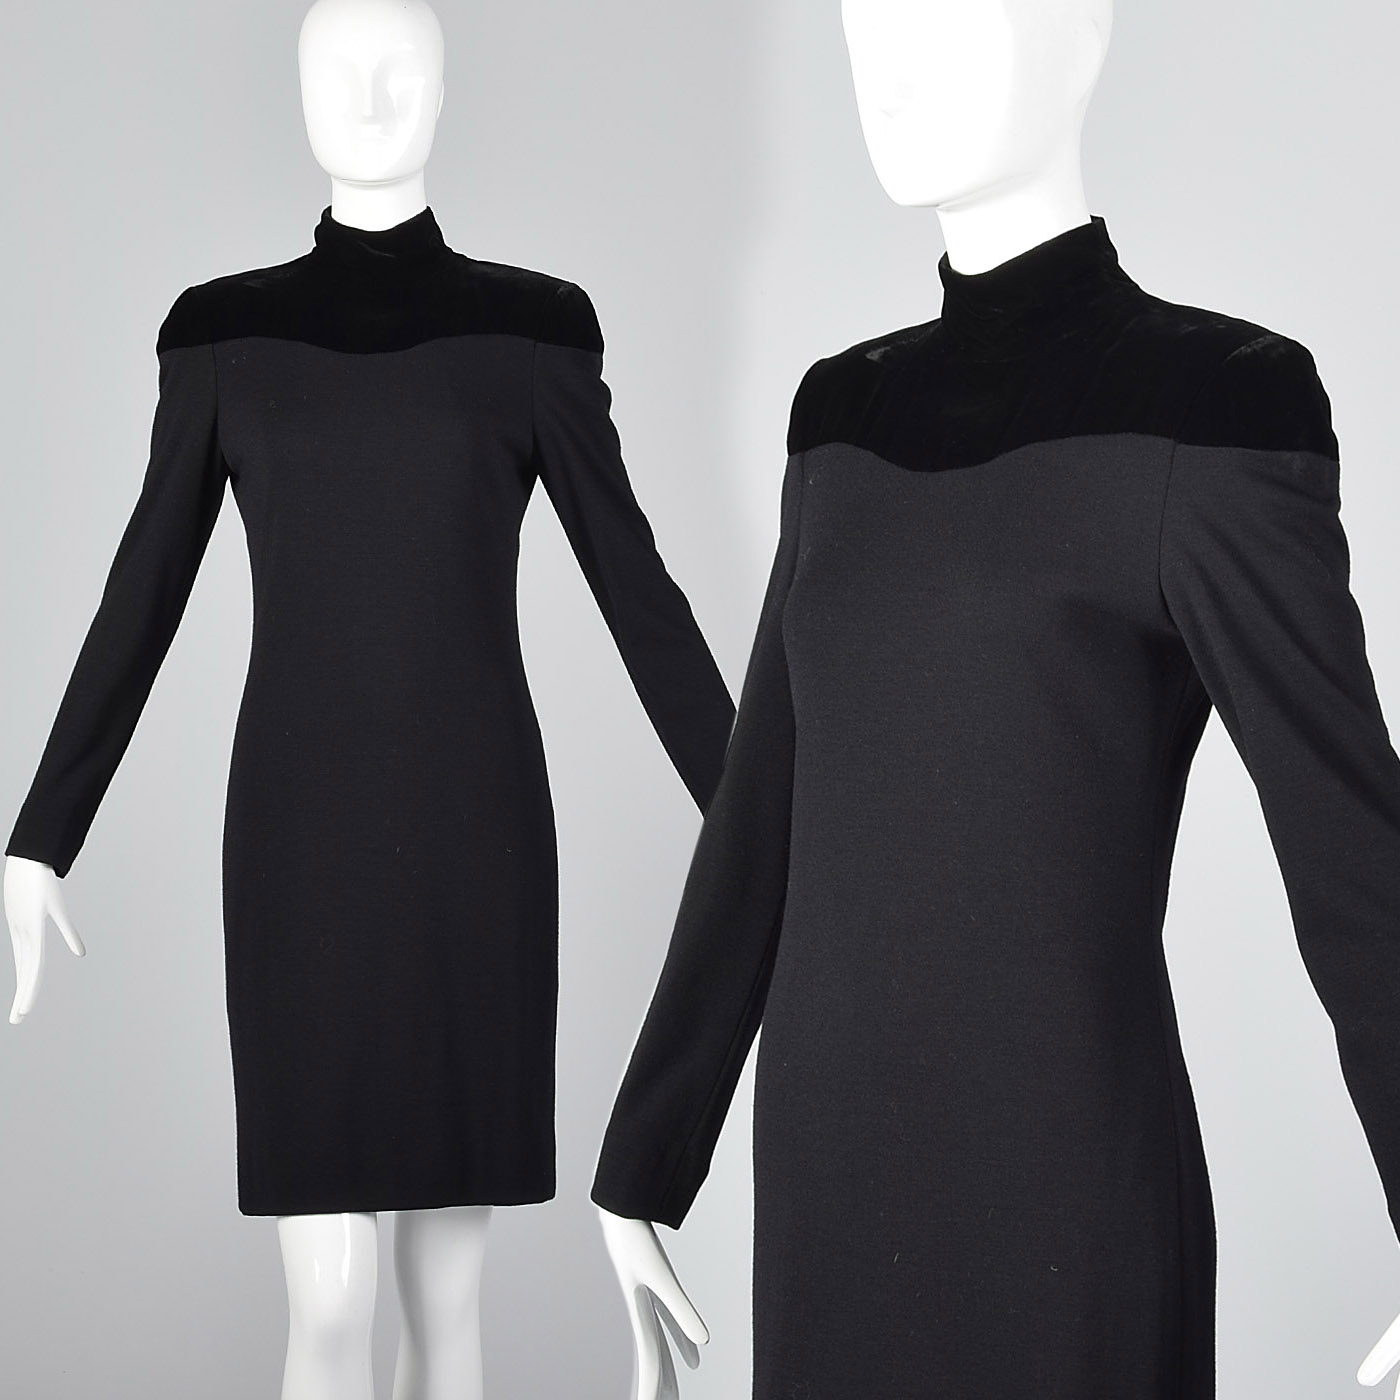 573a1eaa992 Lanvin Tight Sexy Little Black Pencil Dress Long Sleeve LBD Sheath Velvet  Wool. Description  You can t go wrong ...